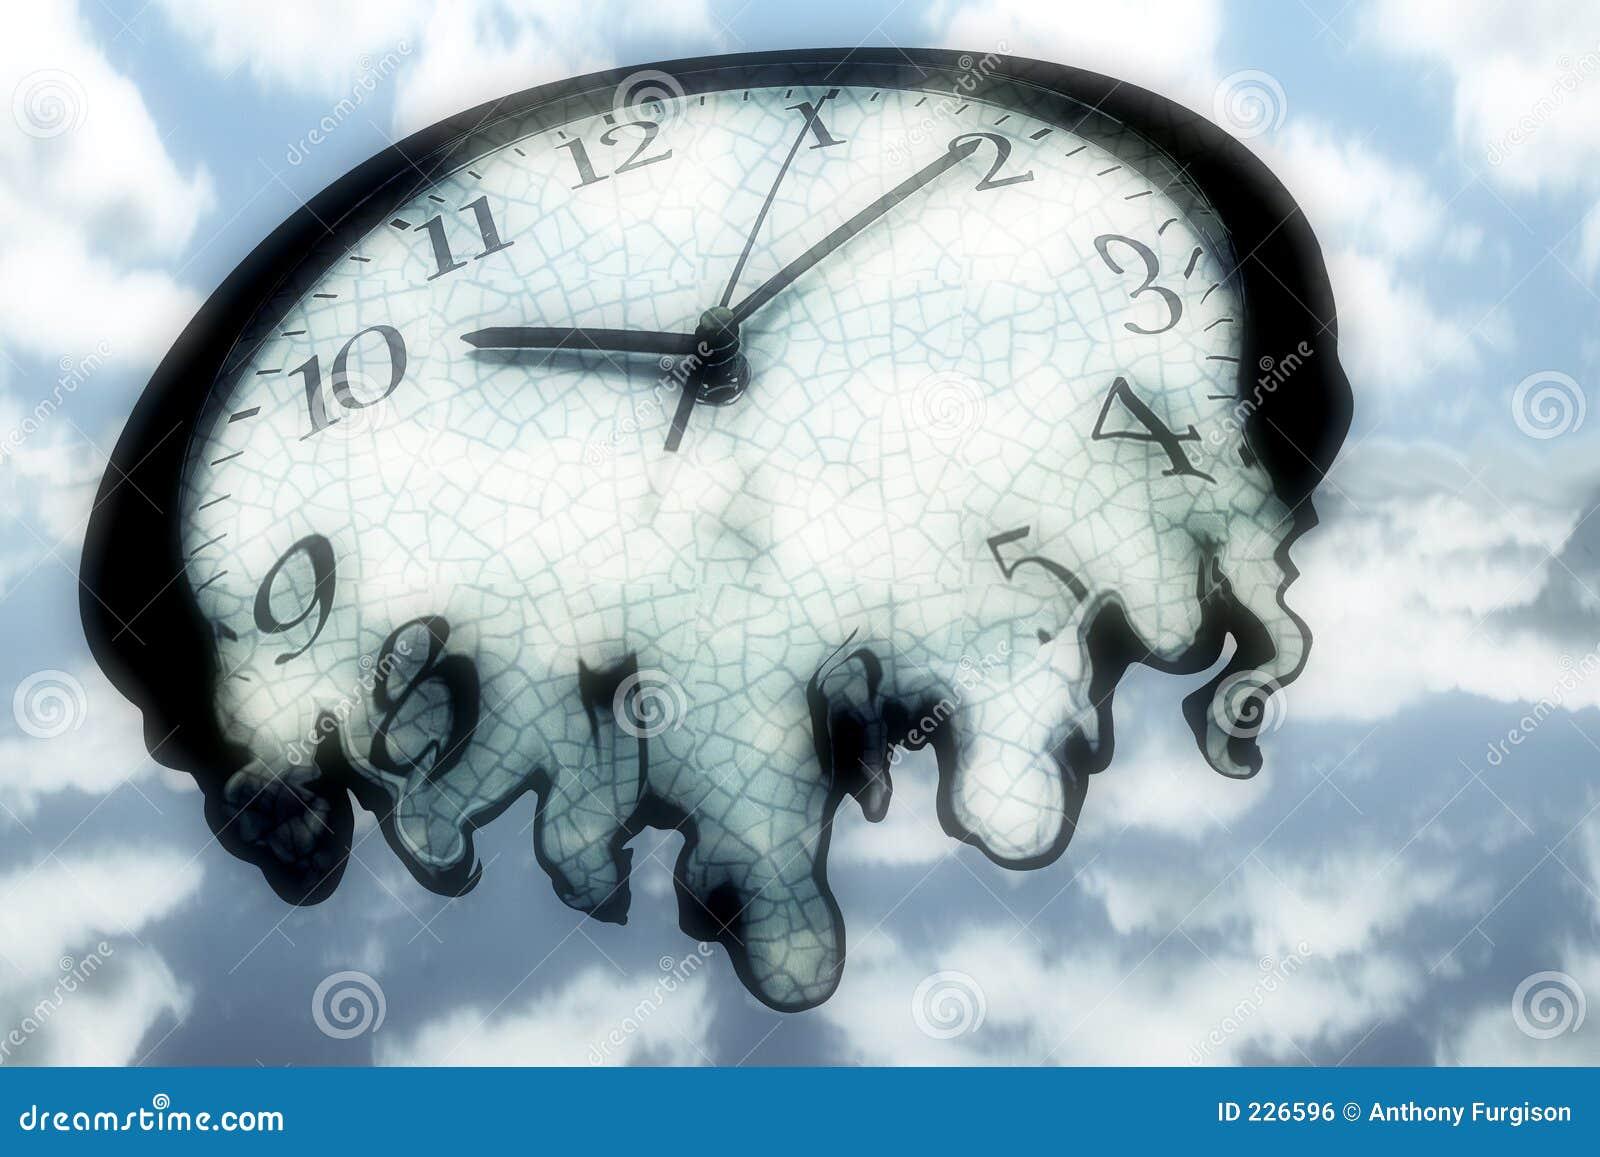 melting clock royalty free stock image